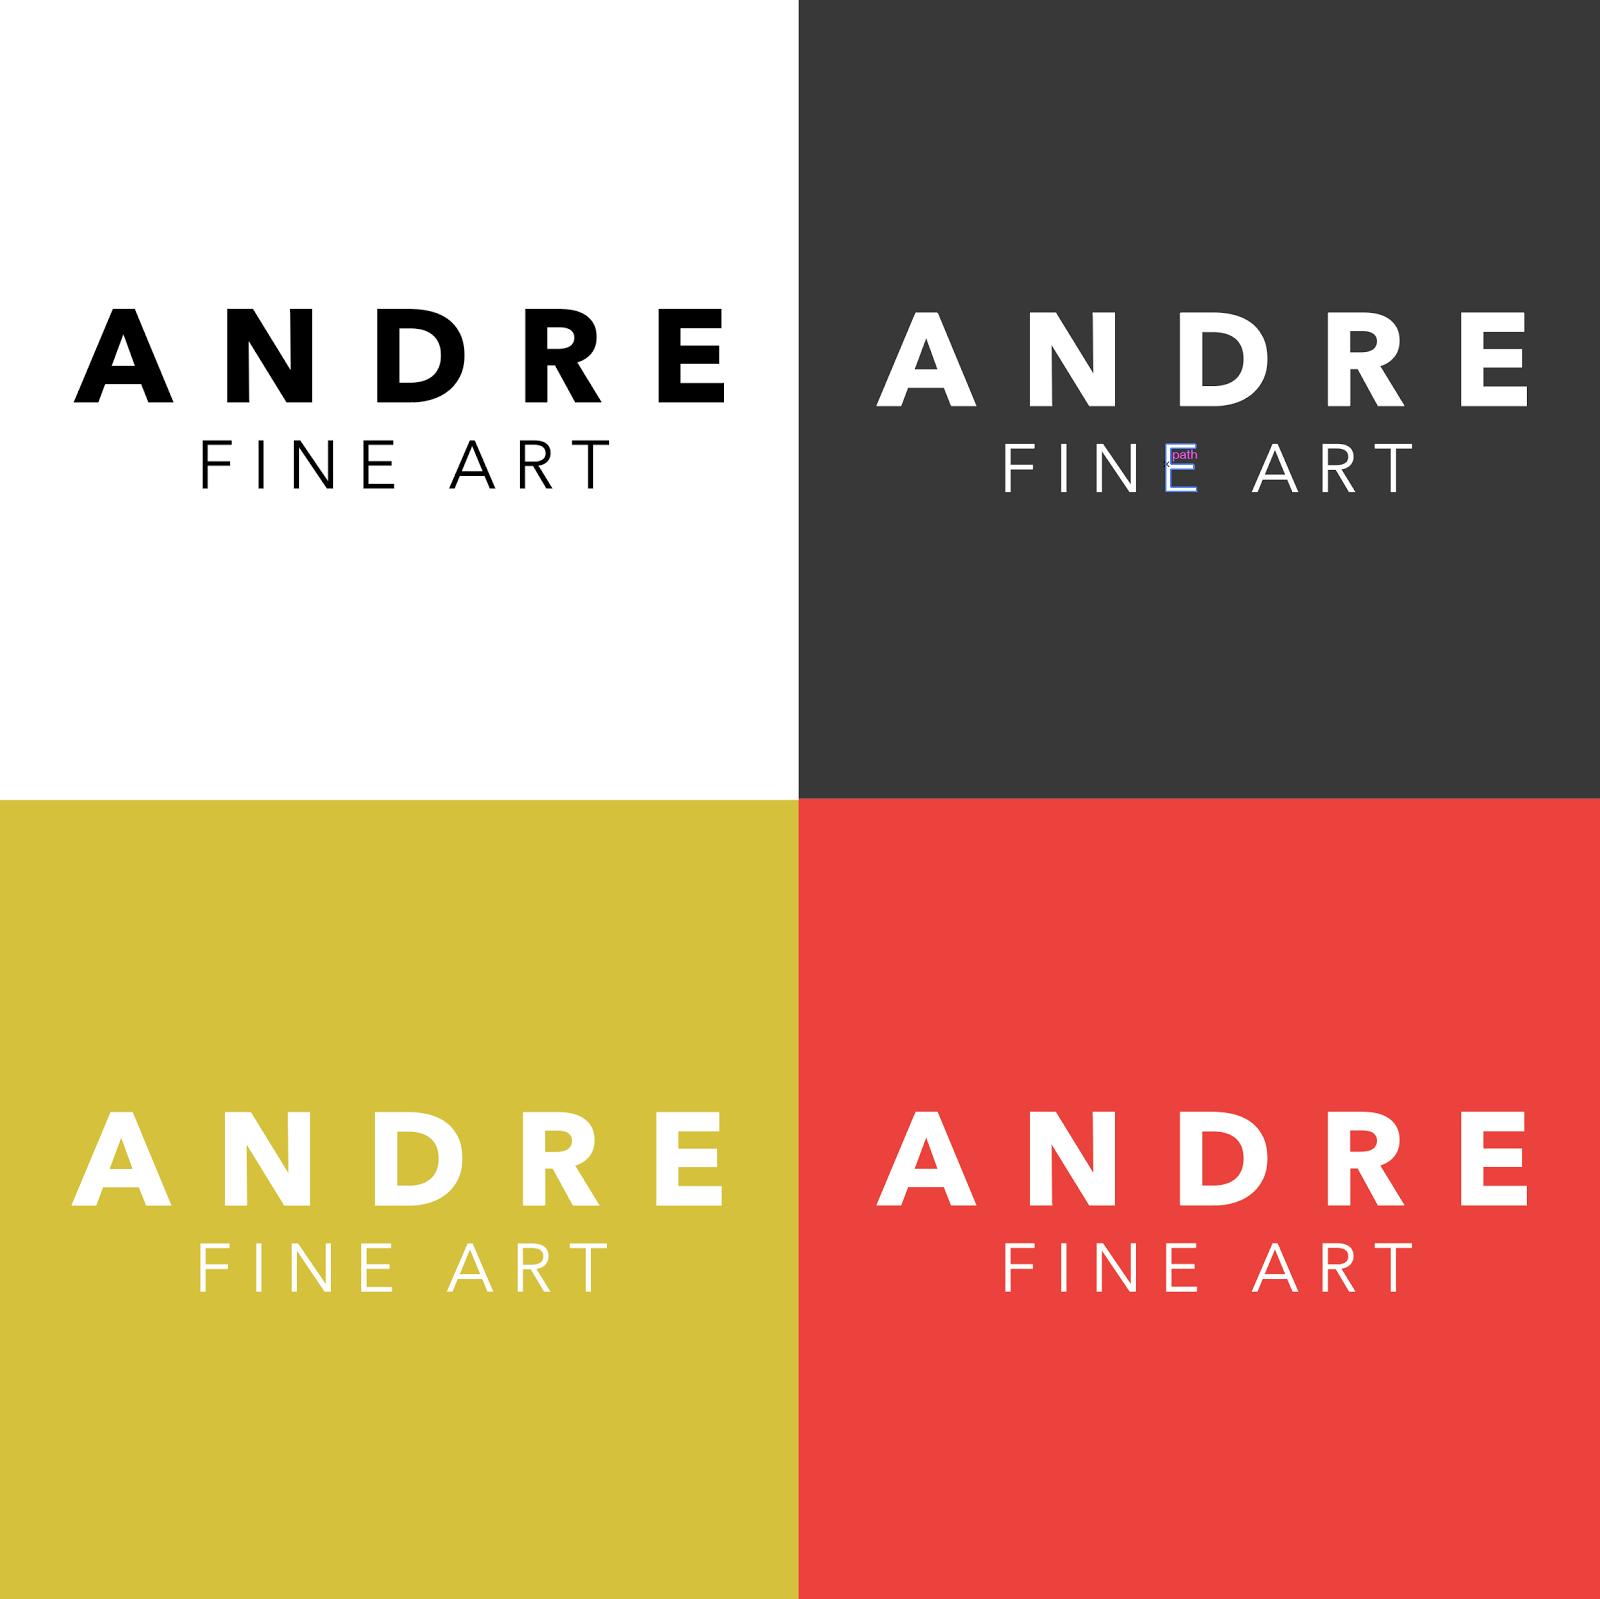 Andre Art Prints